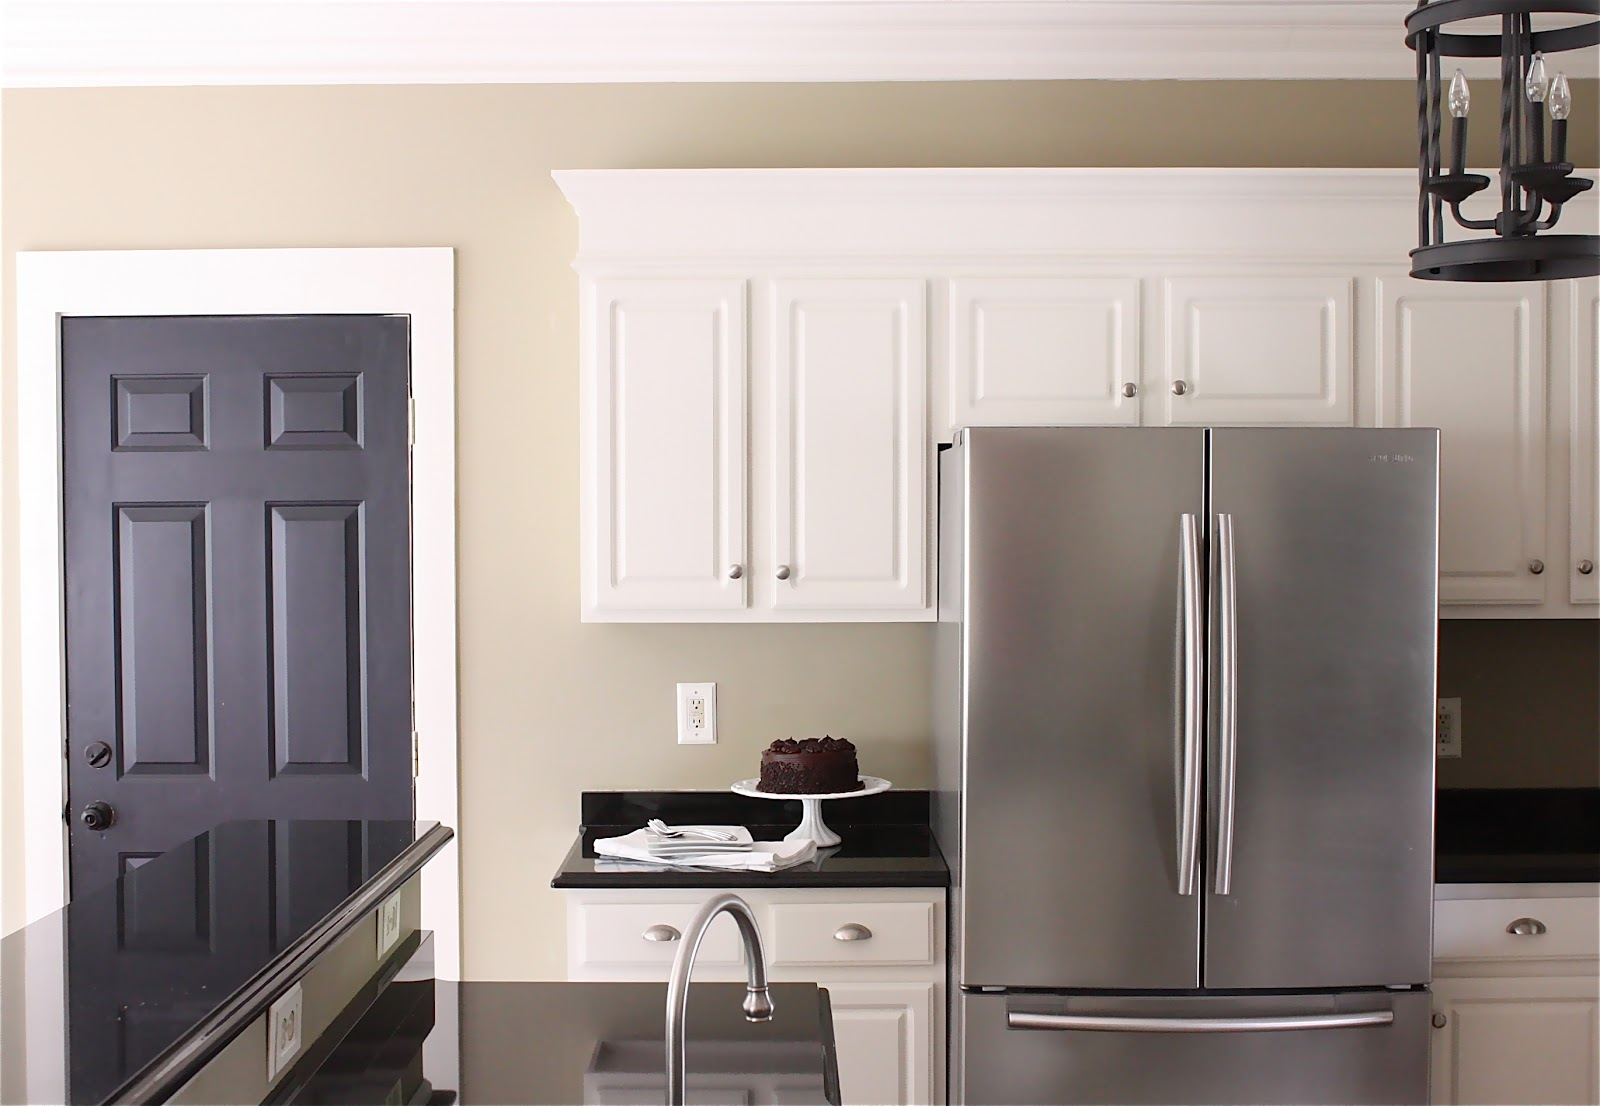 paint kitchen cabinets white kitchen painting ideas kitchen cabinets painted cabinetry the